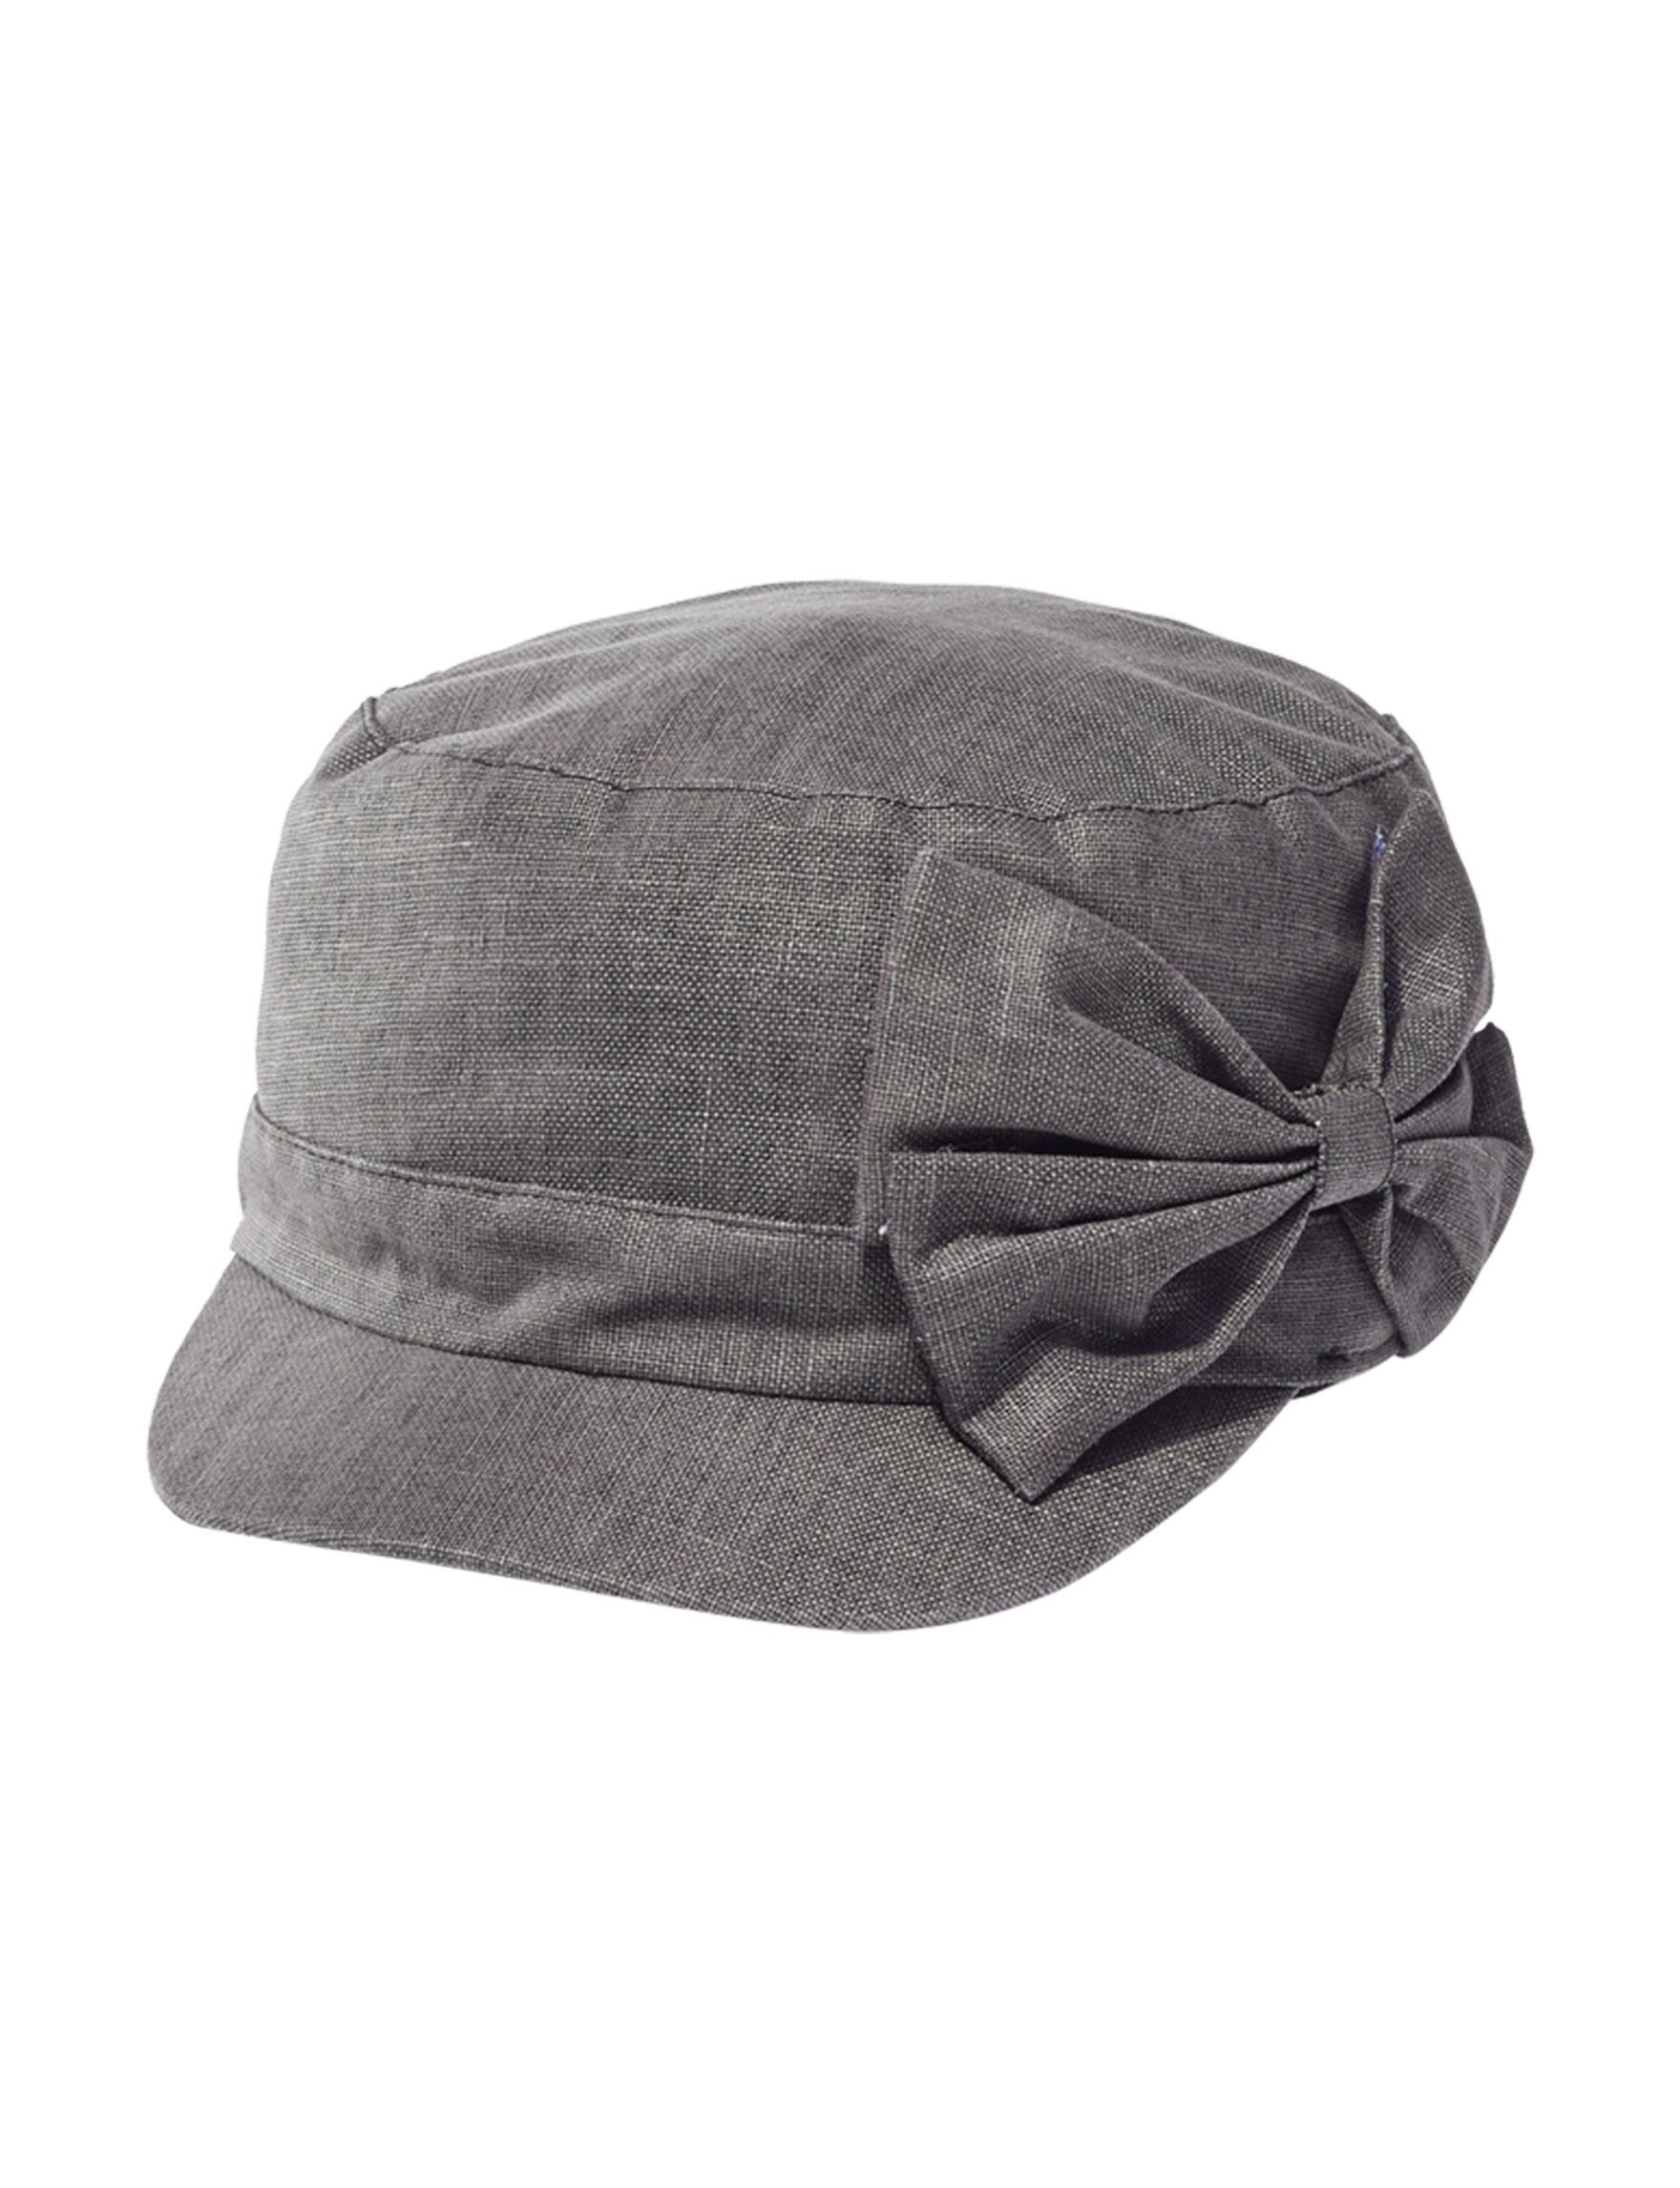 David & Young Light Grey Hats & Headwear